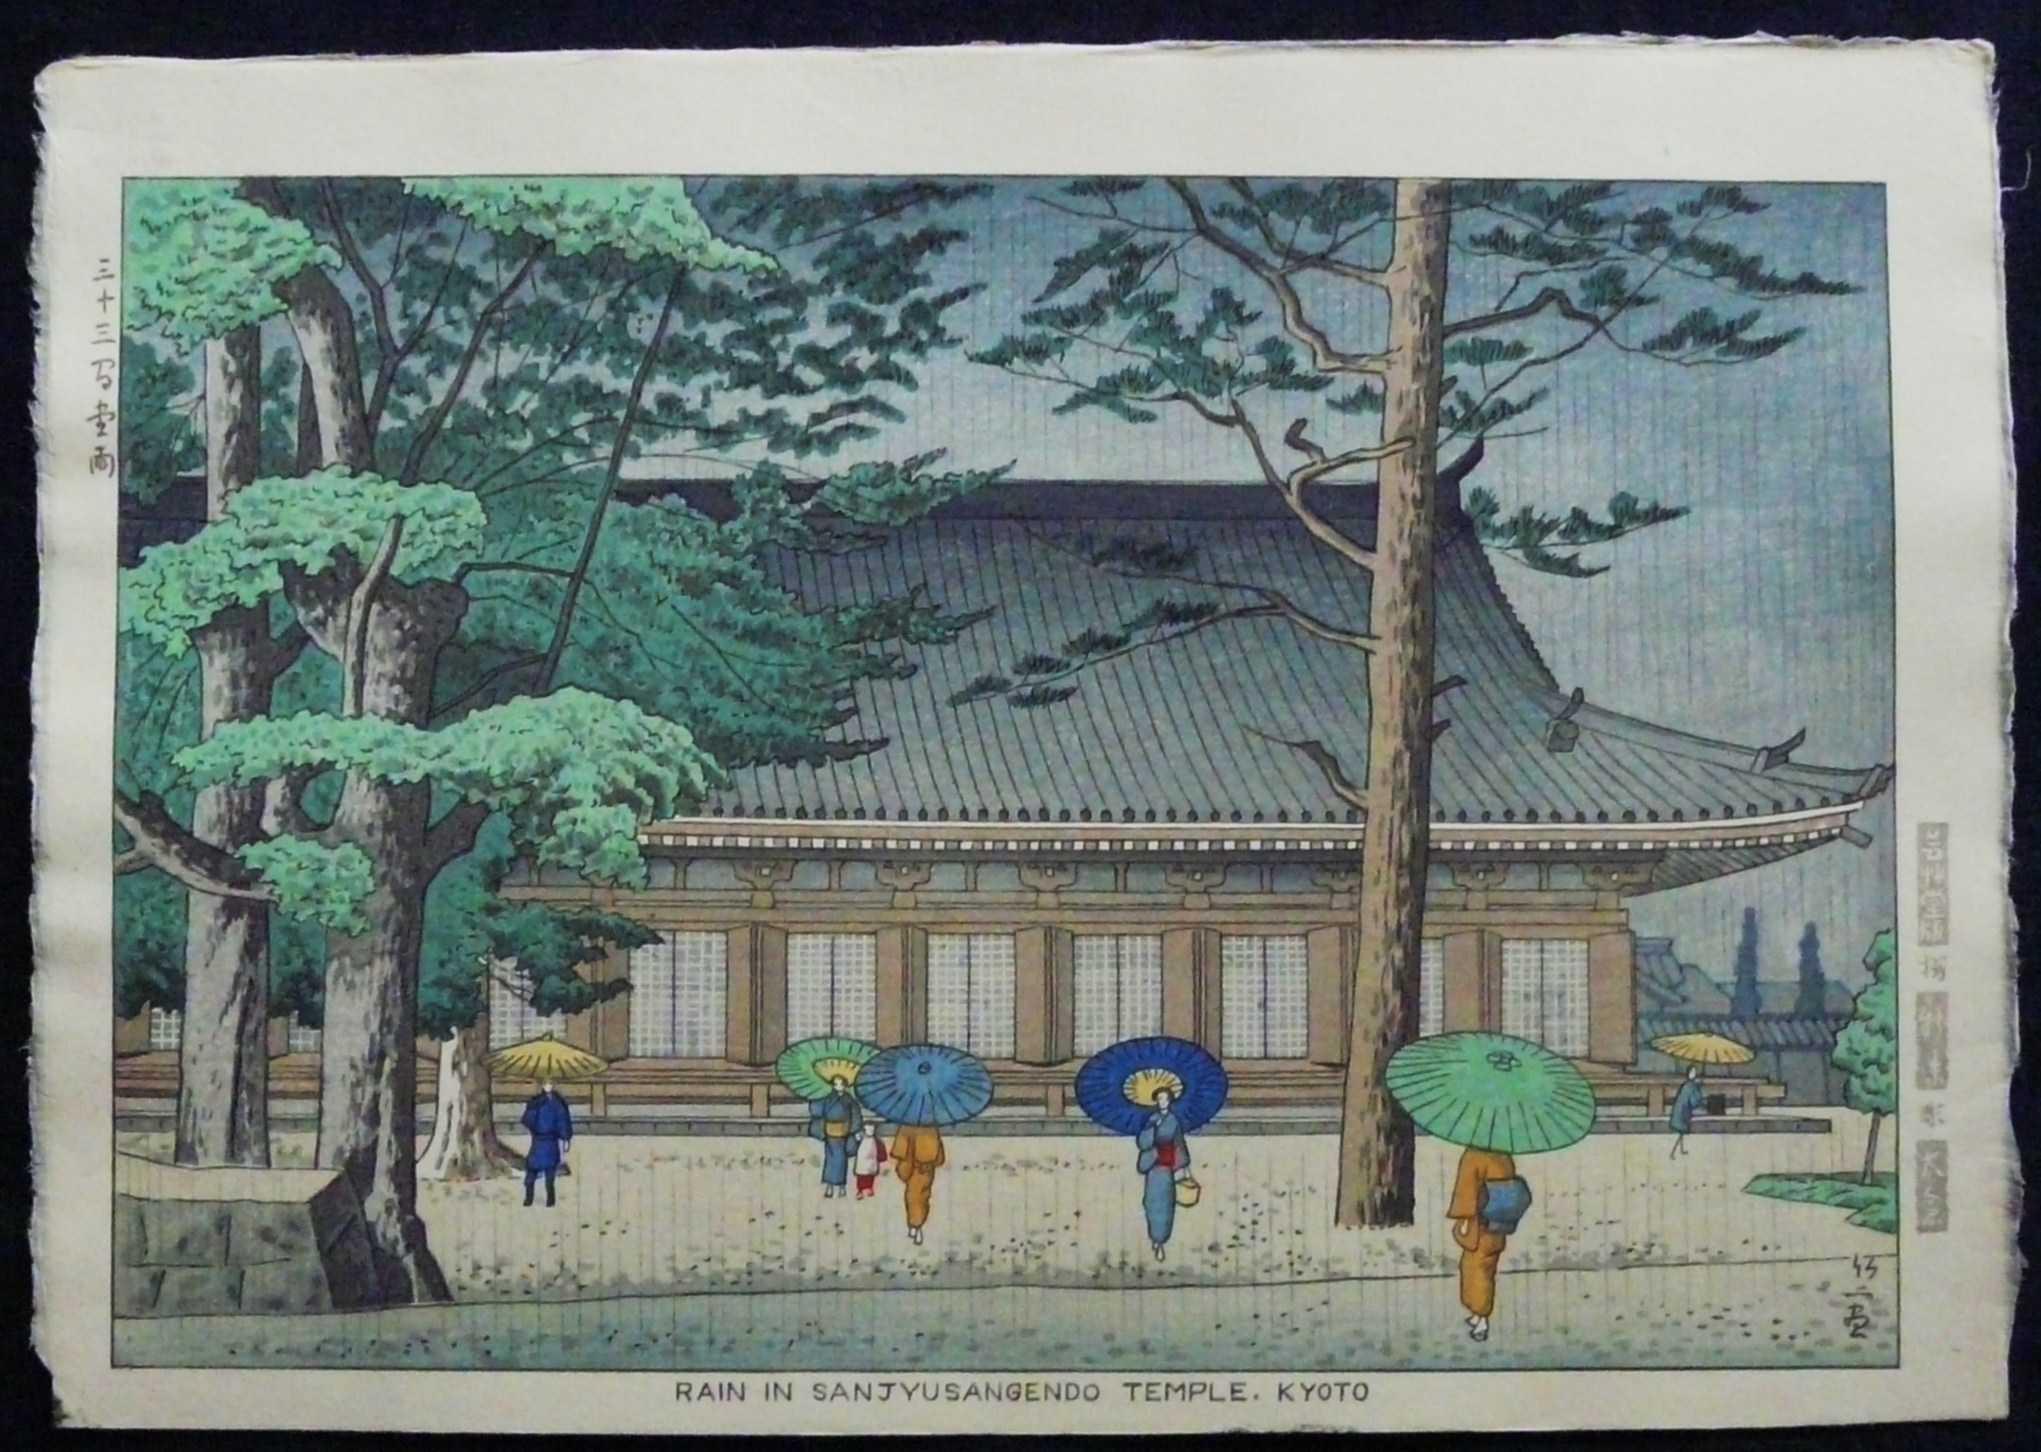 Takeji Asano: #P3781 RAIN IN SANJYUSANGENDO TEMPLE, KYOTO